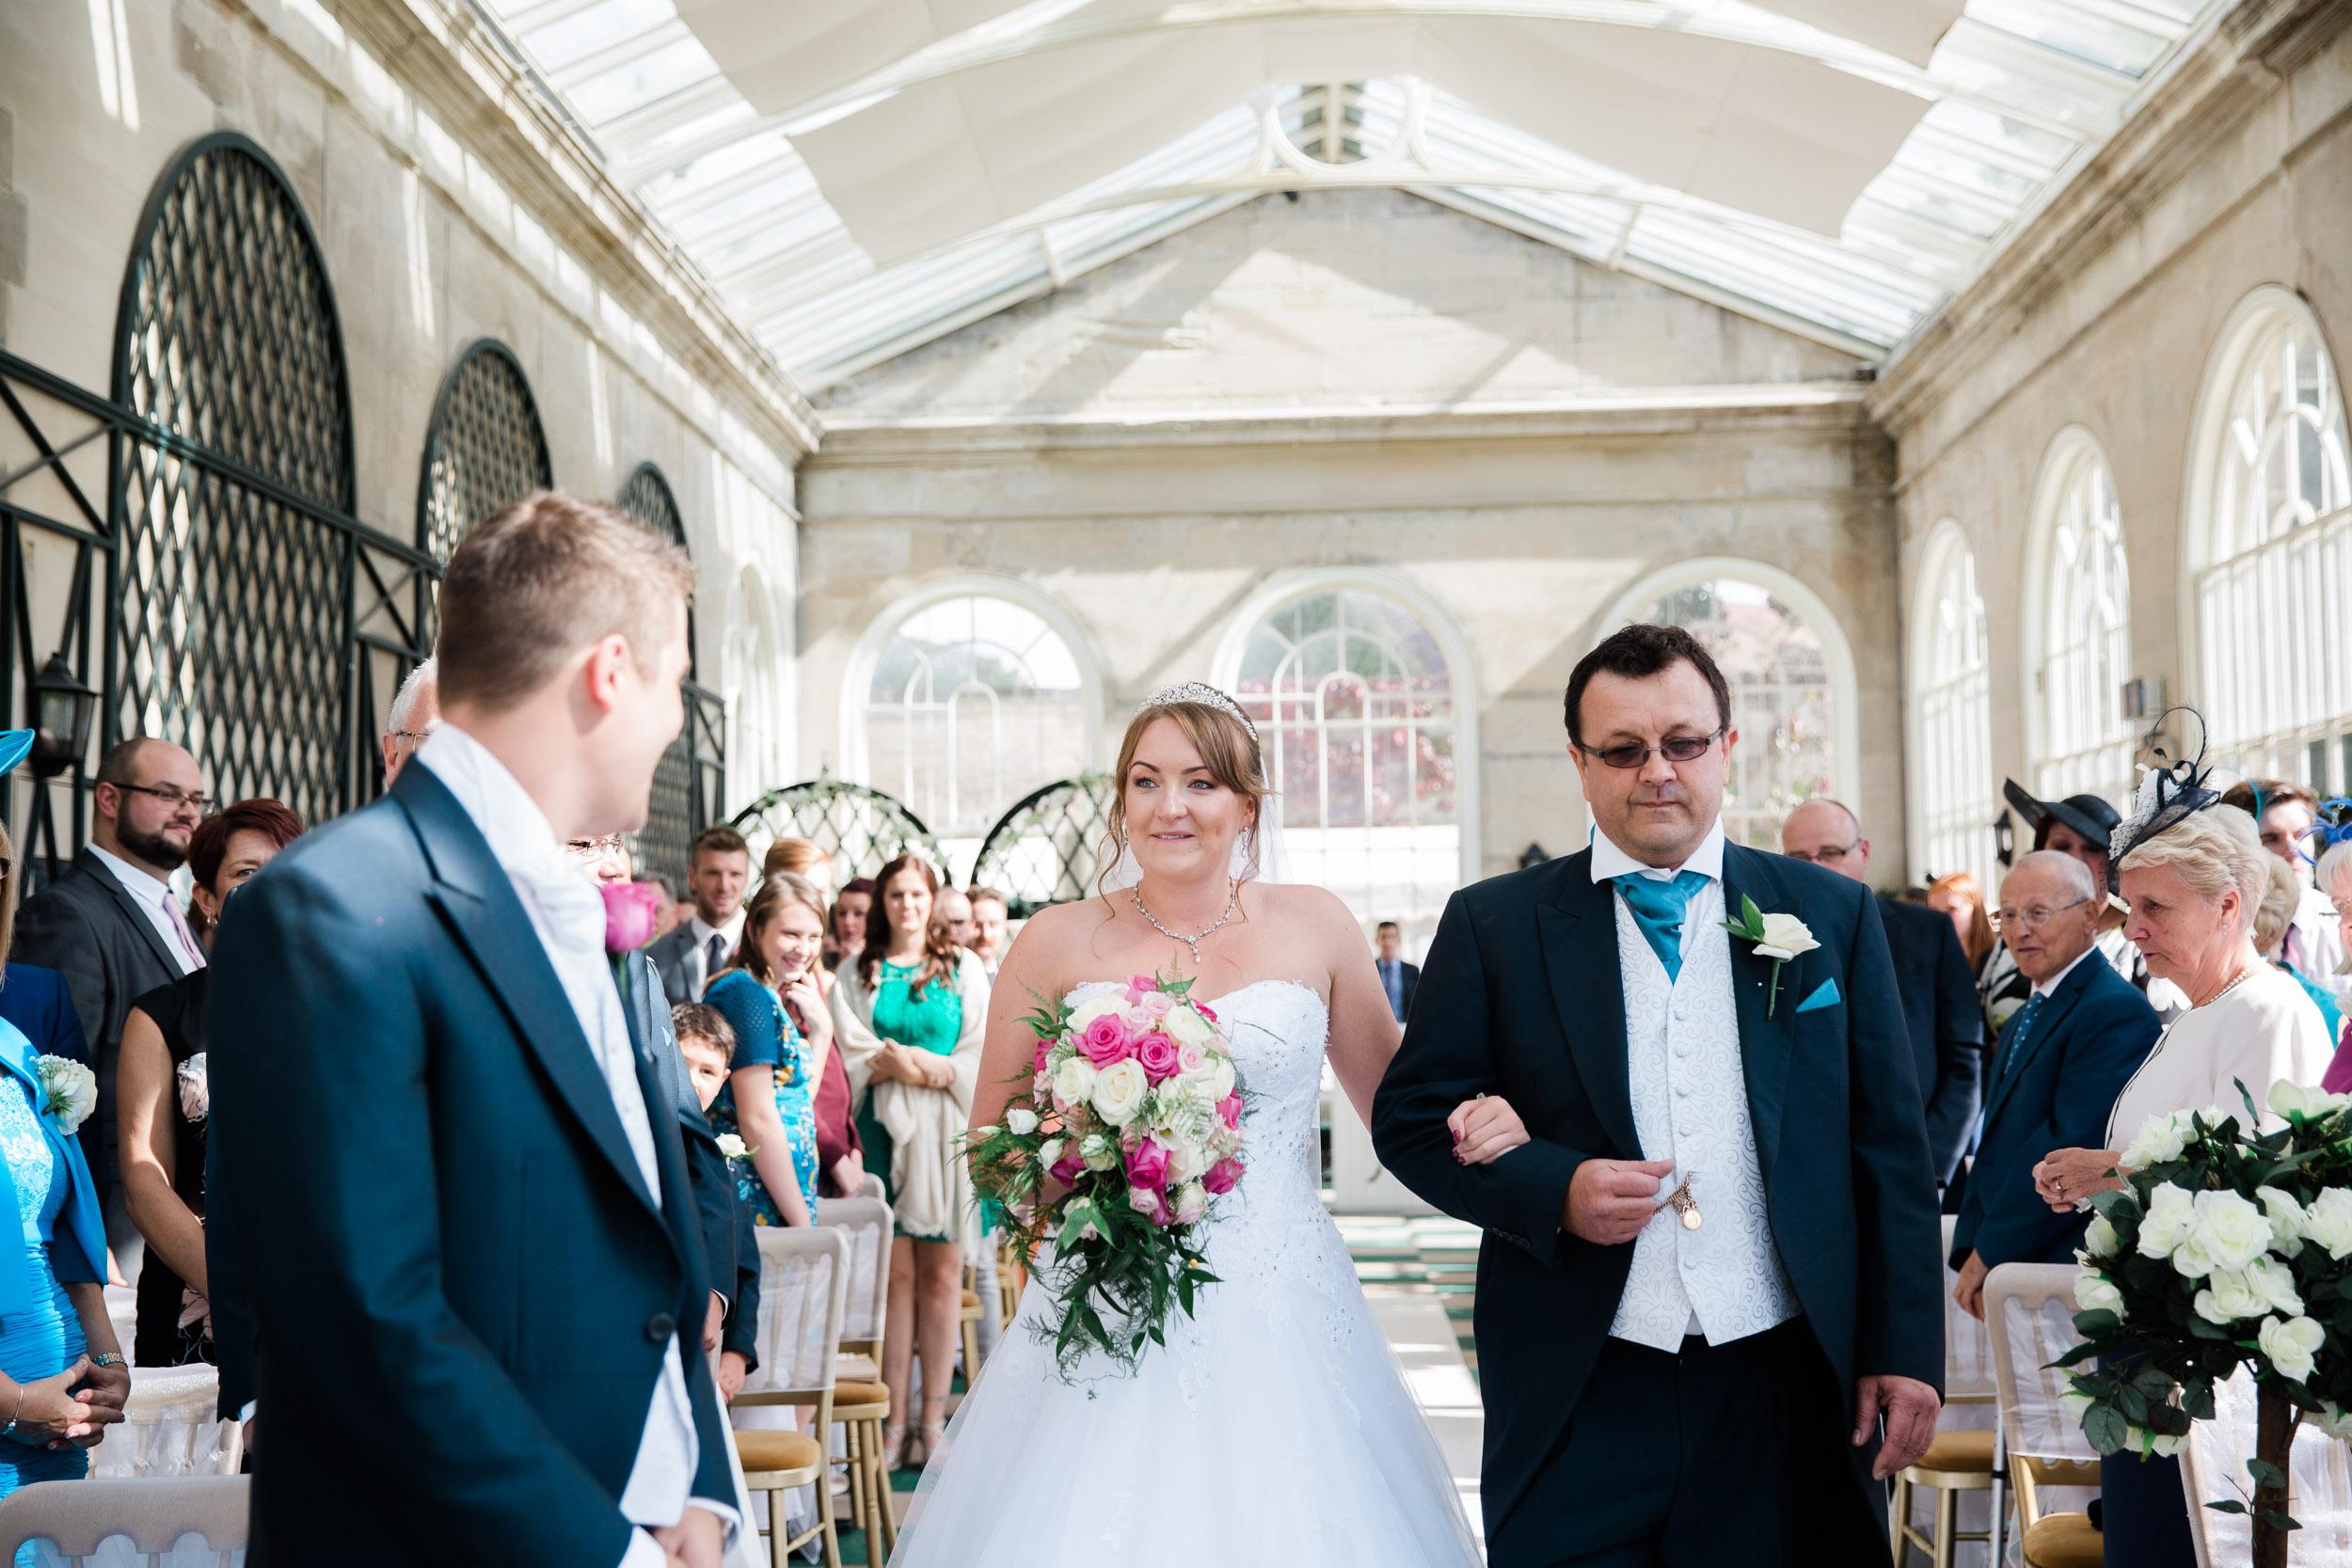 stoneleigh-abbey-wedding-photography-32